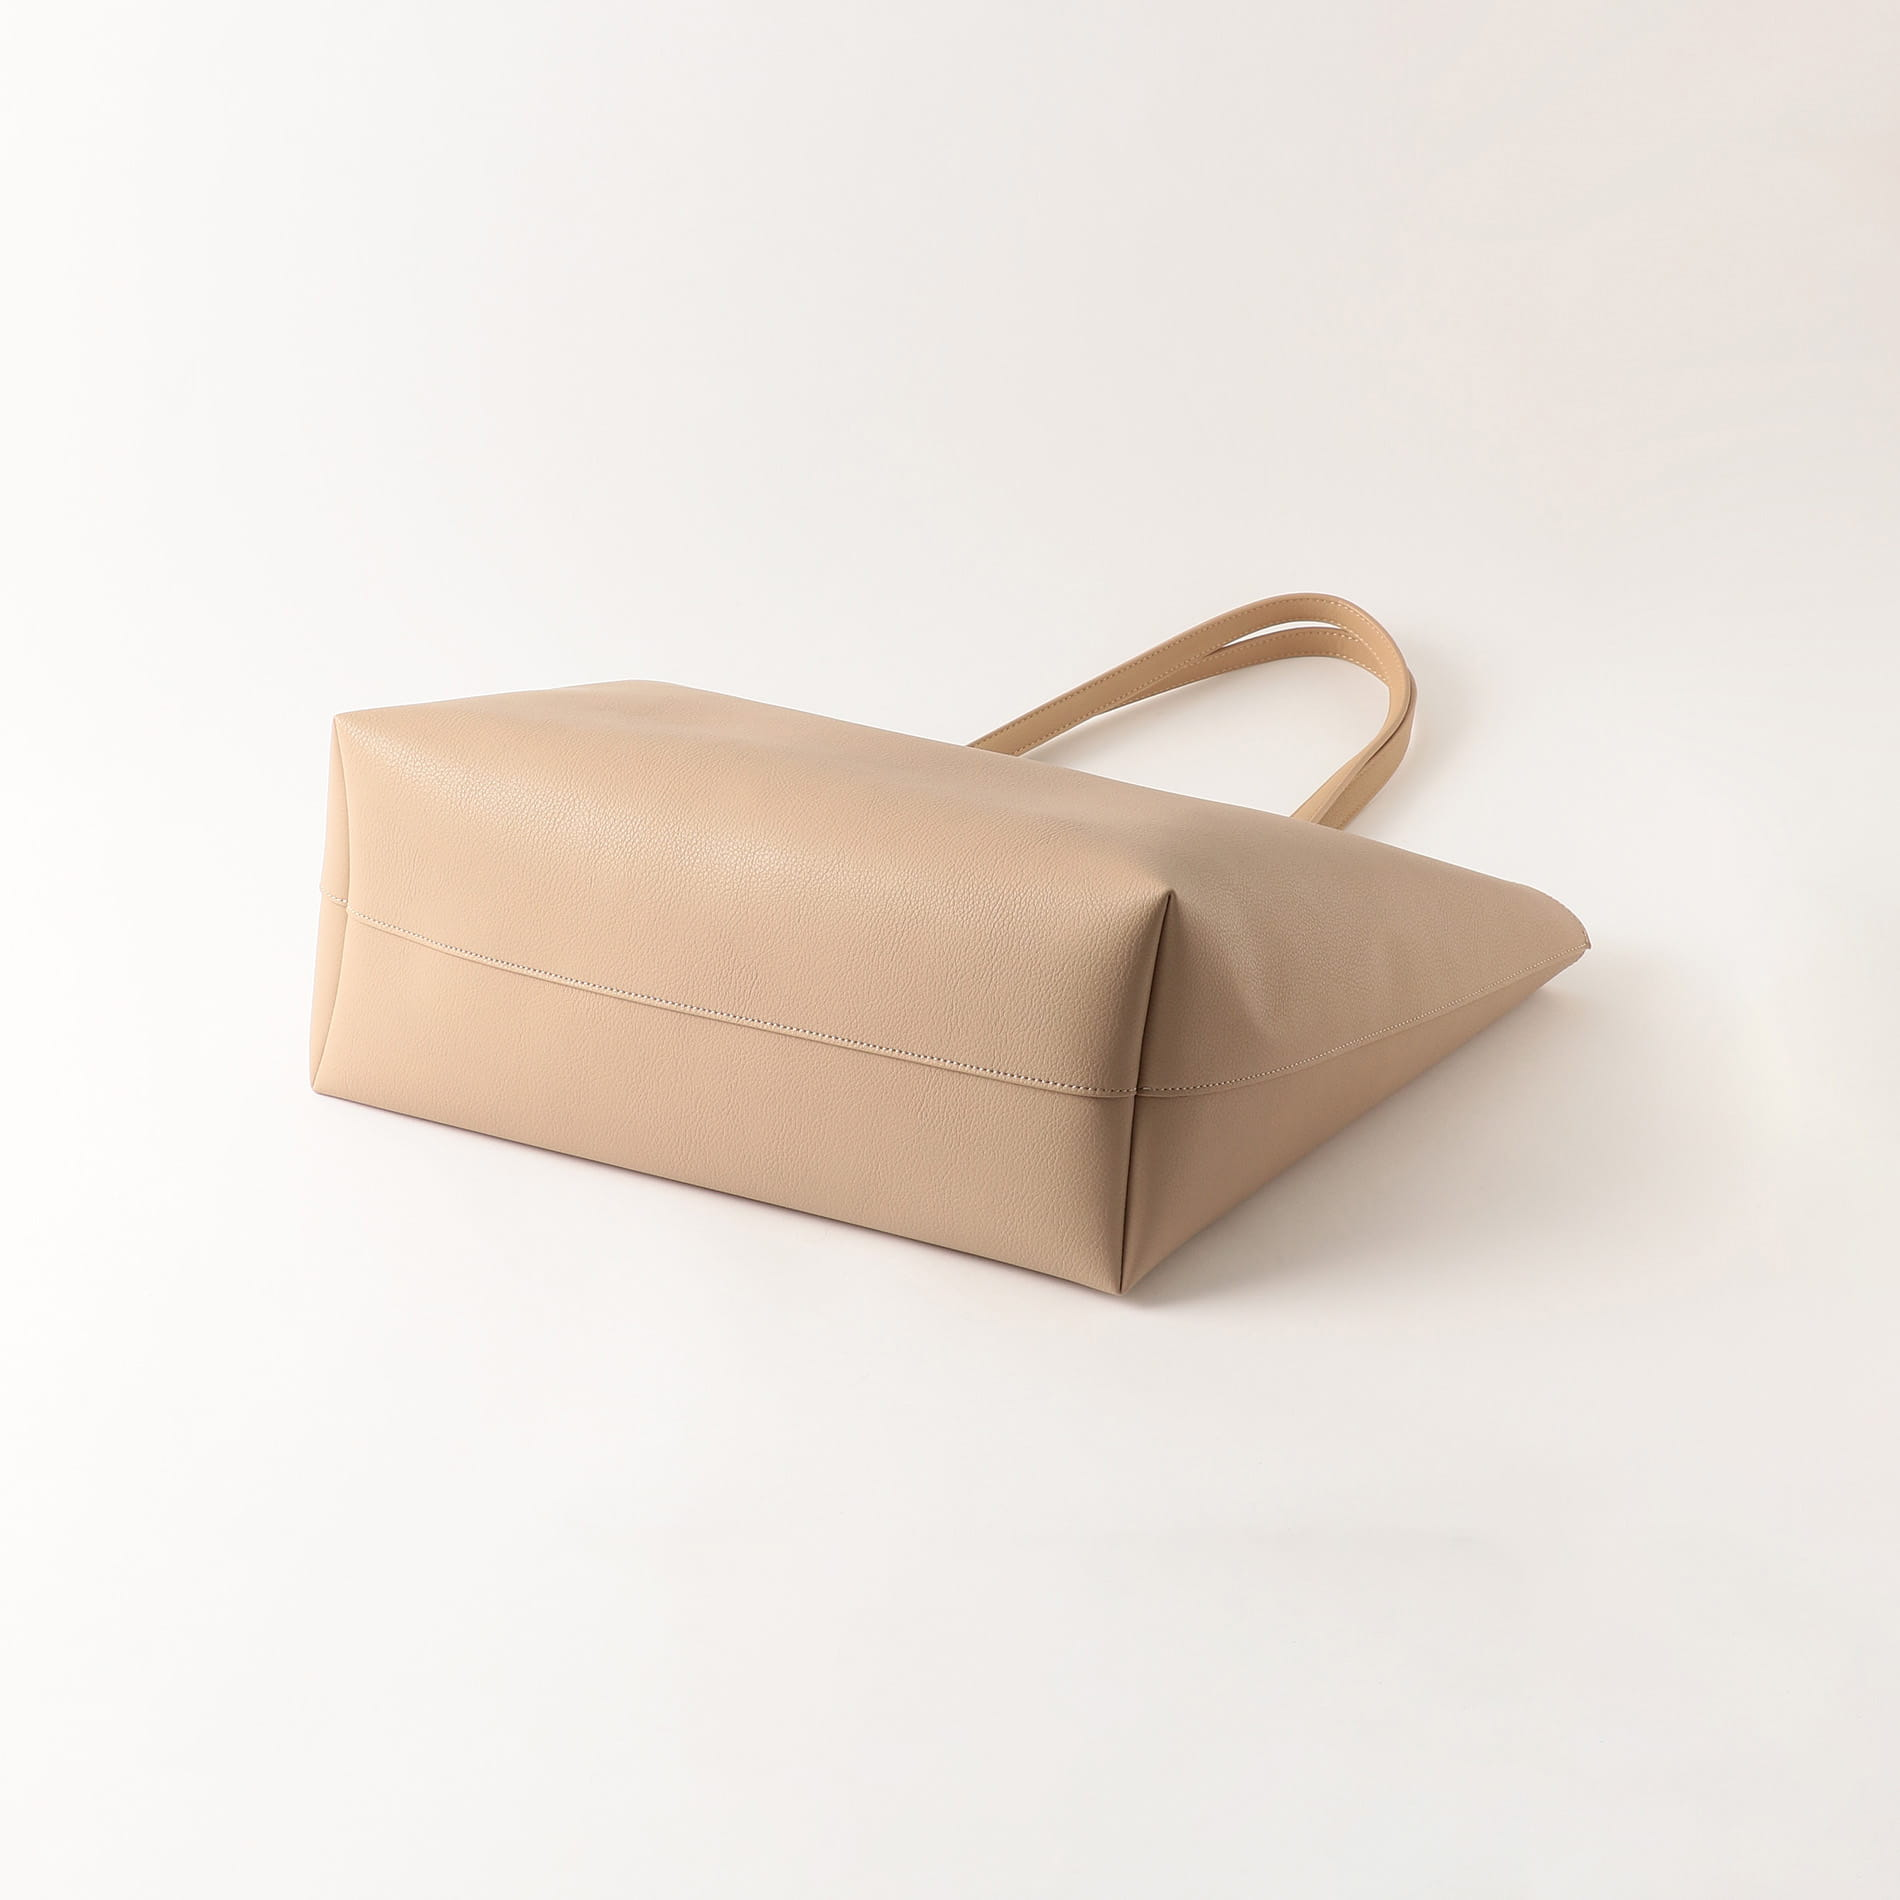 【Safari5月号掲載】LOVELESSクラッチイントートバッグ